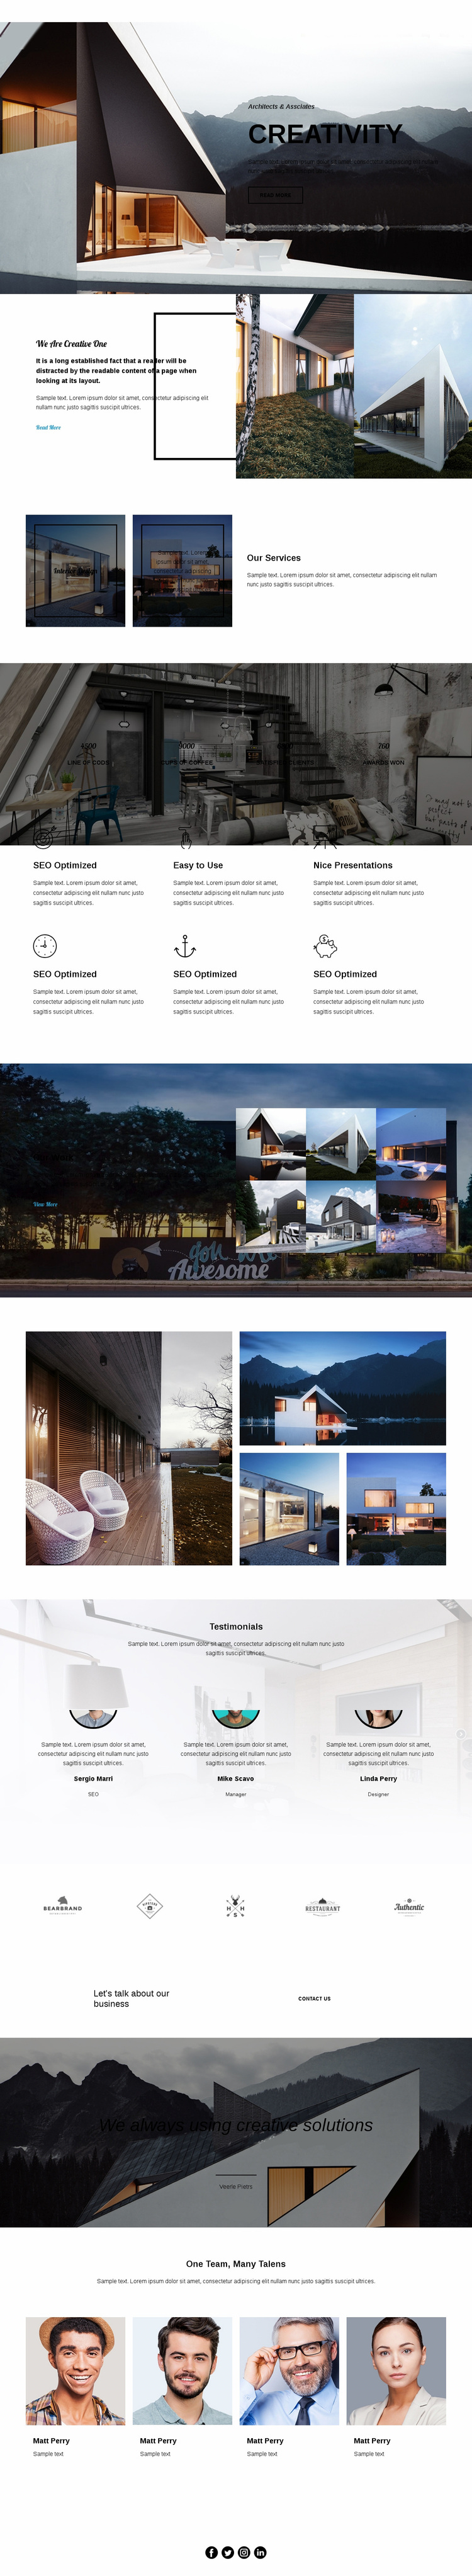 Creativity in architecture Website Design